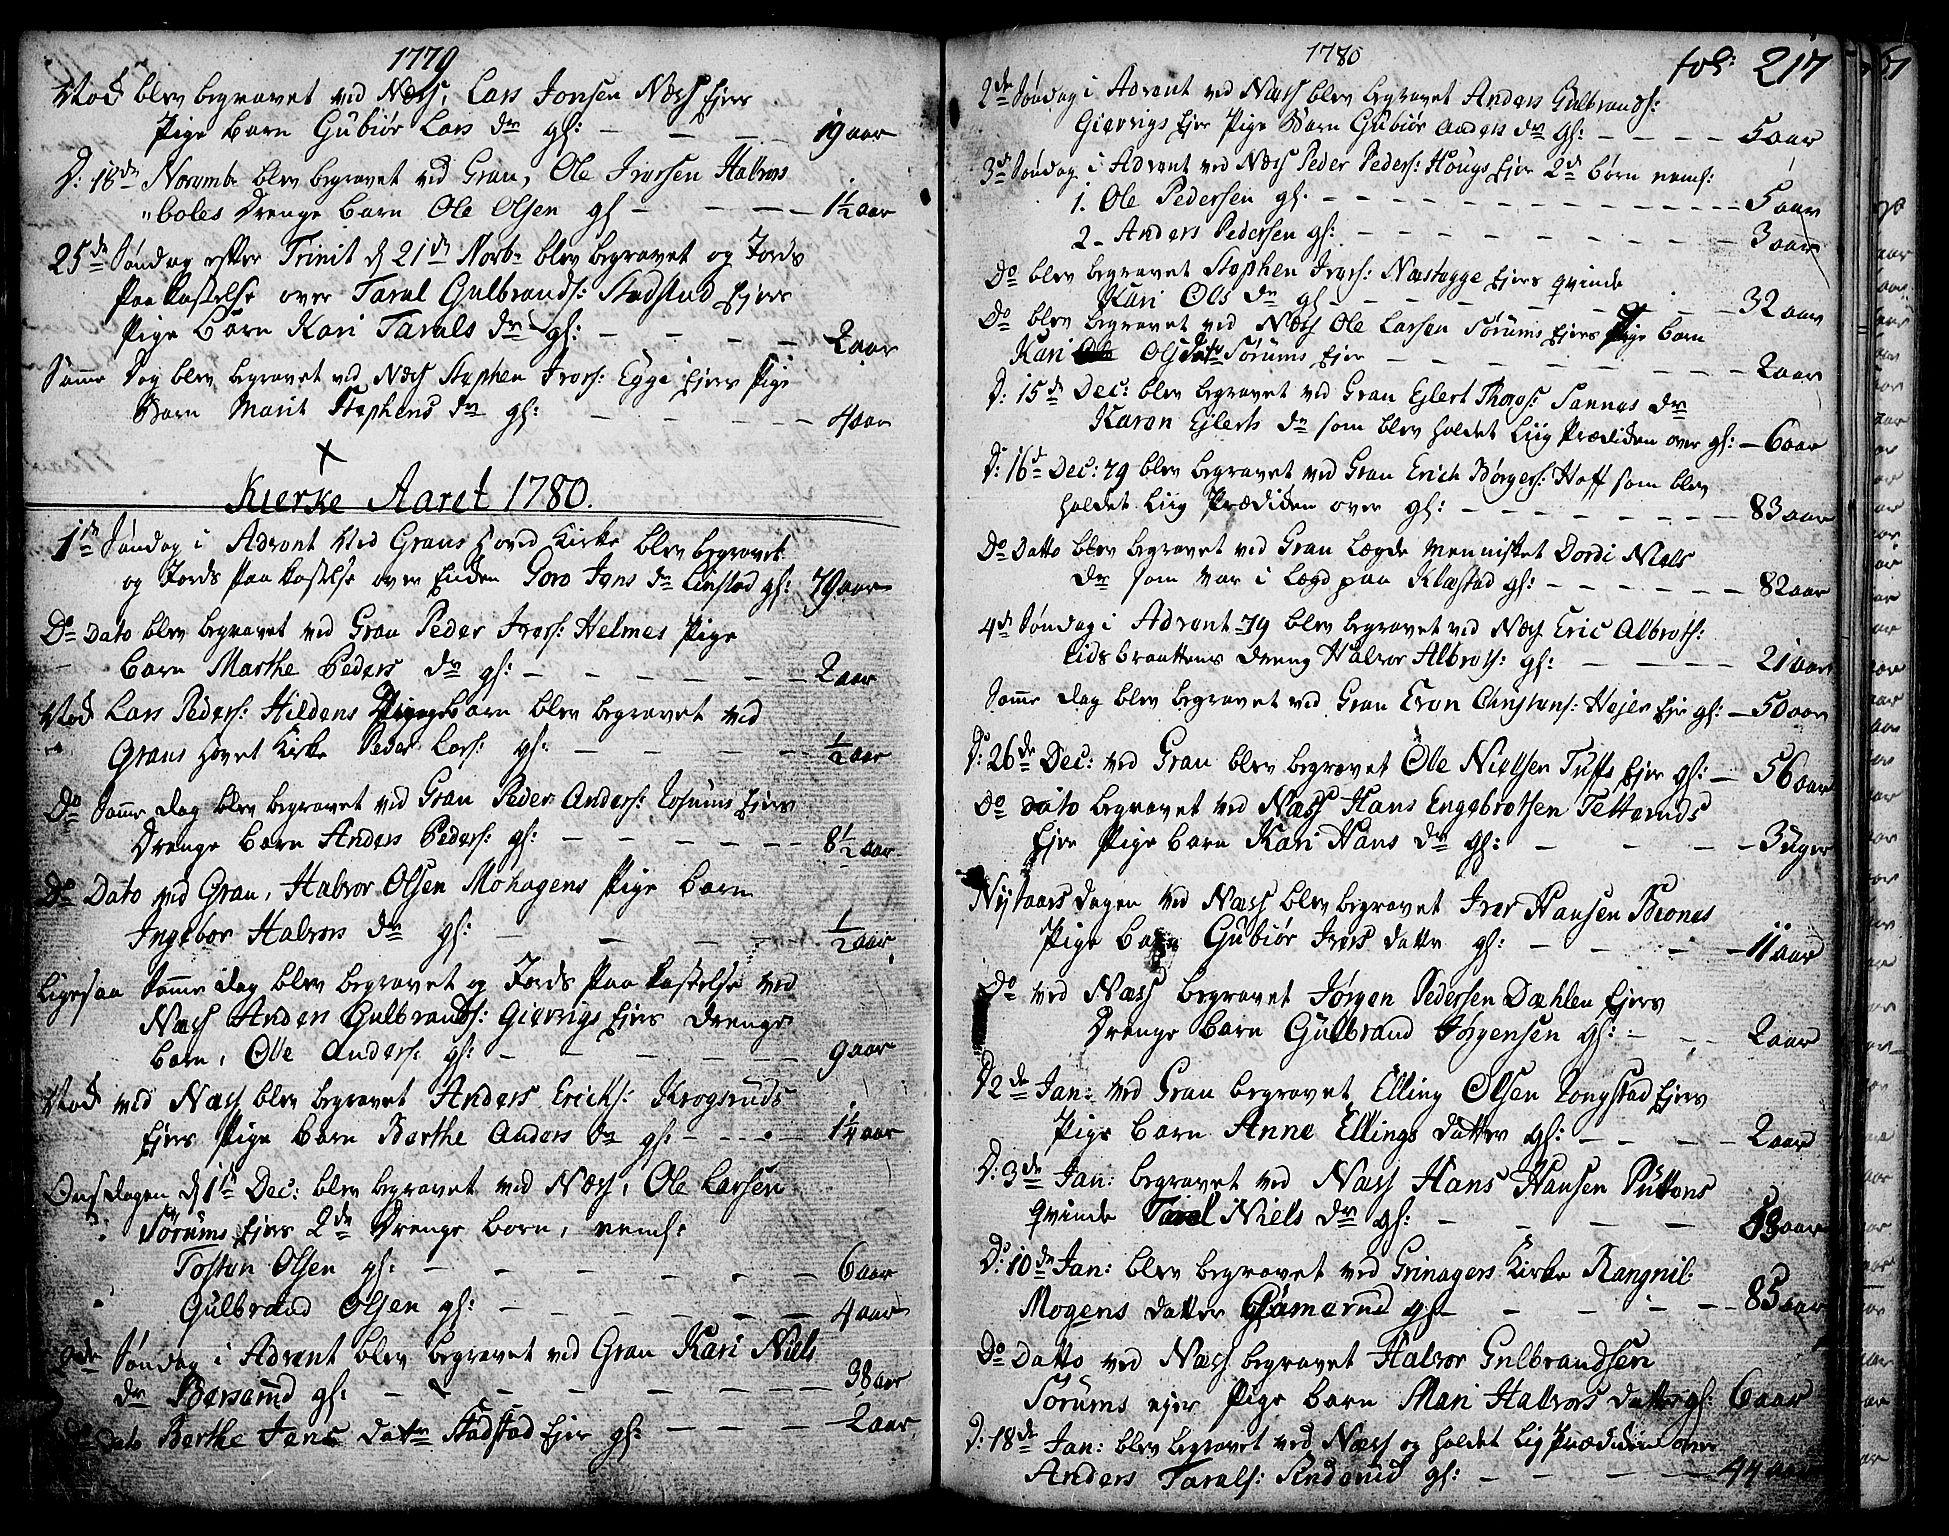 SAH, Gran prestekontor, Ministerialbok nr. 5, 1776-1788, s. 217